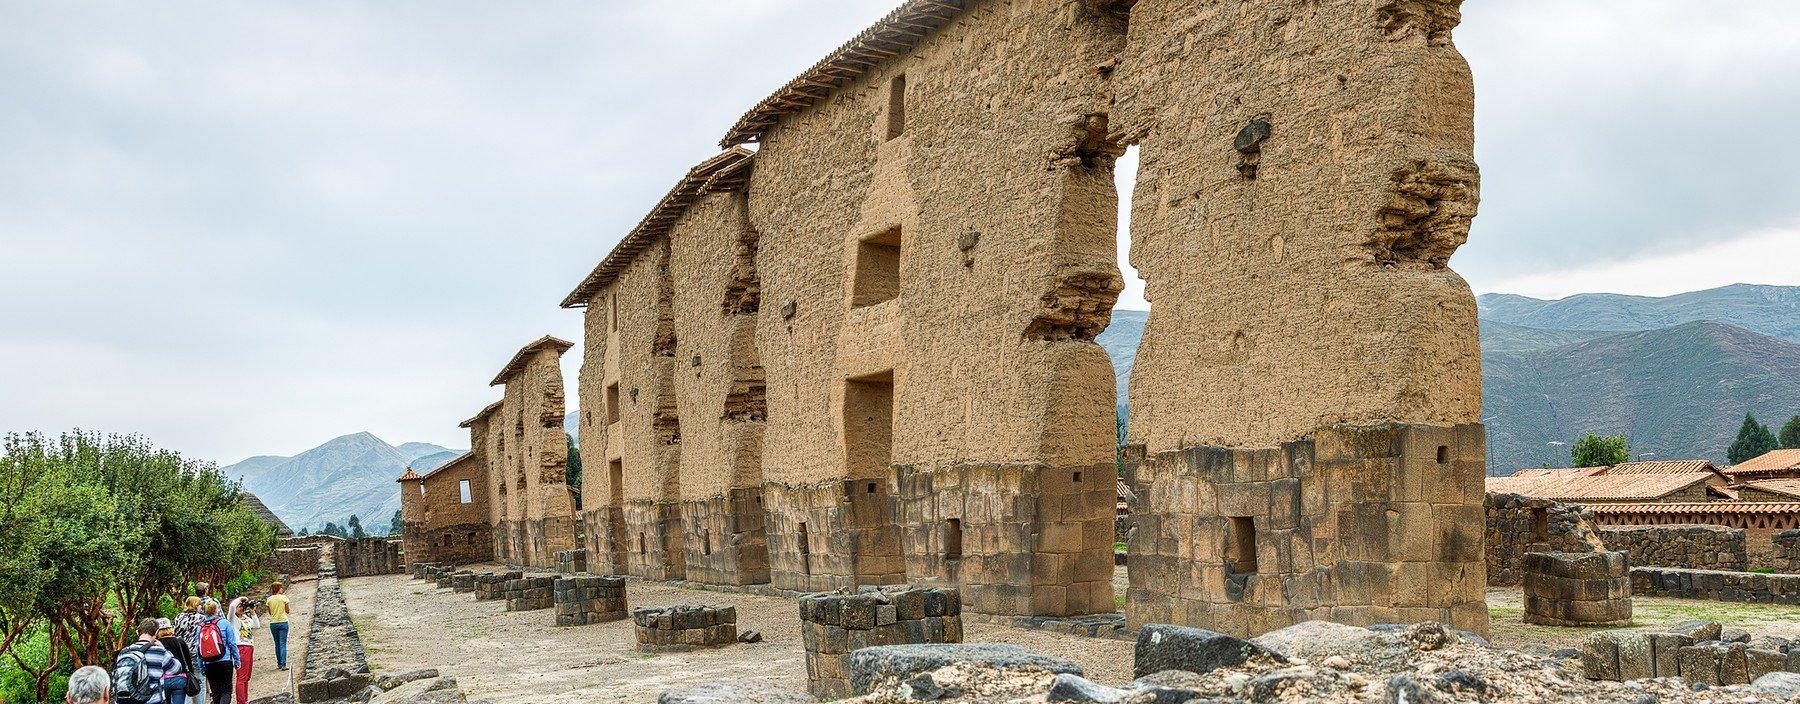 pe, cuzco, wiracocha tempel (2).jpg